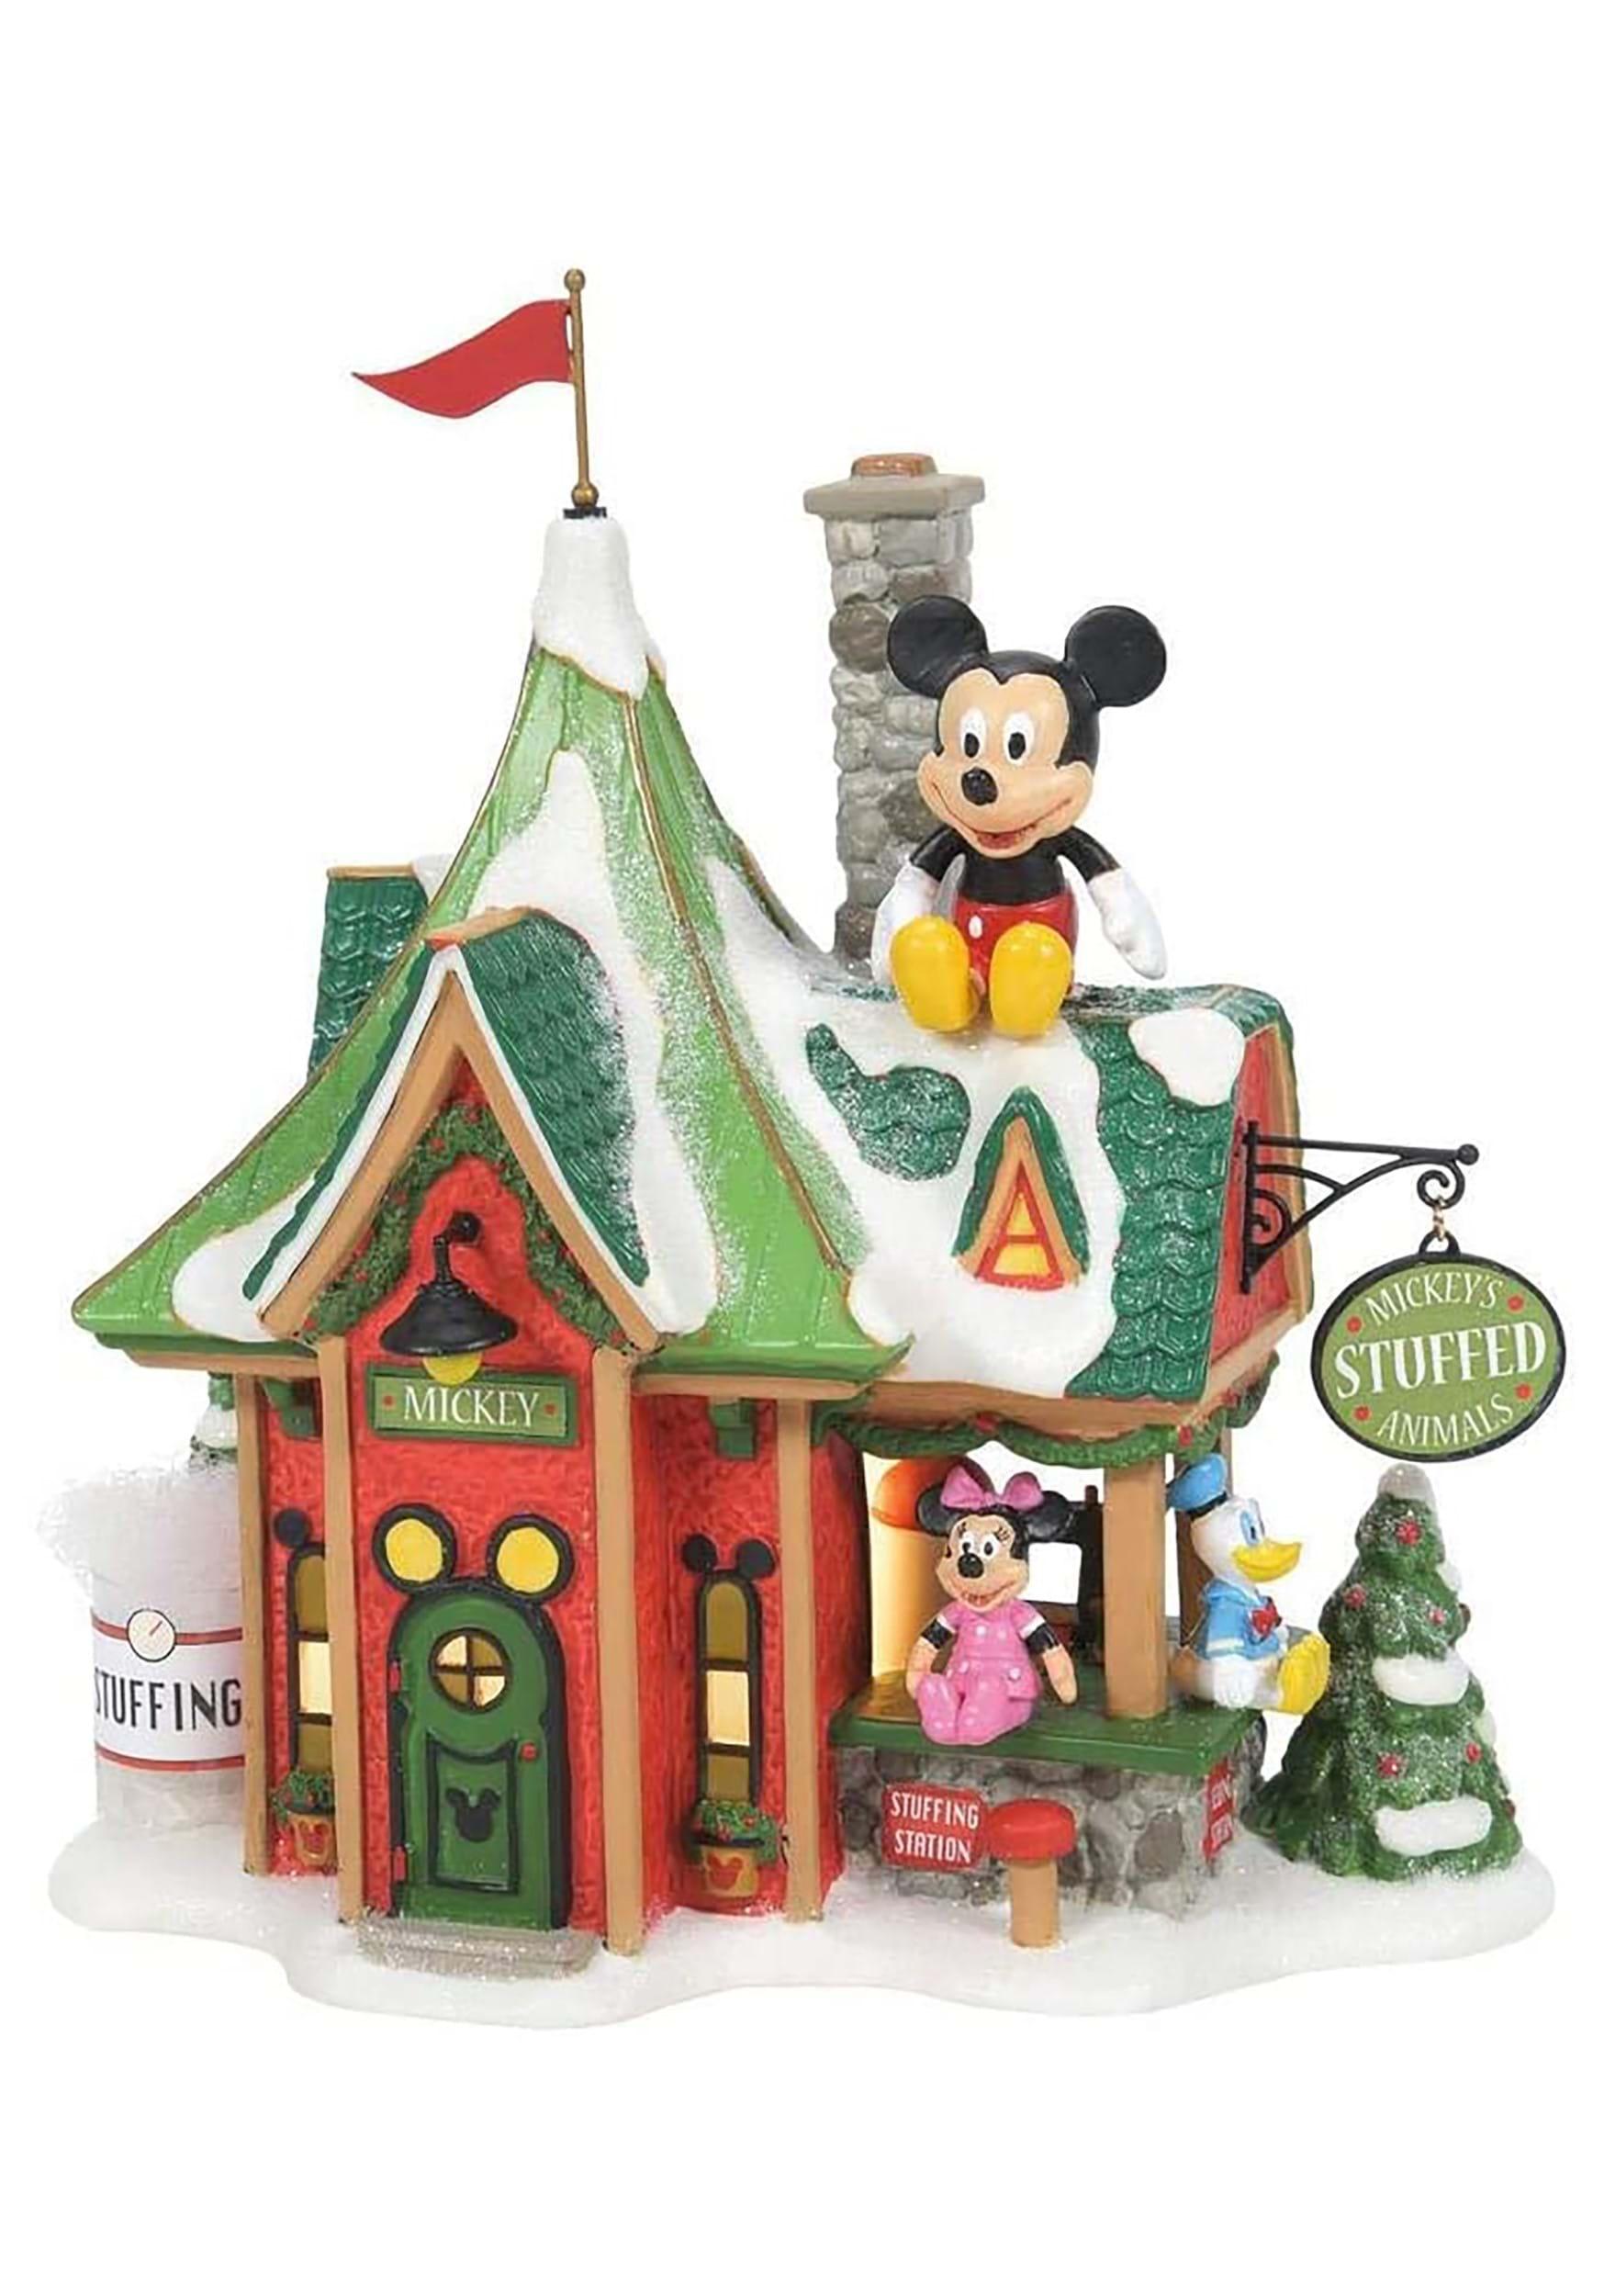 Department 56 Mickeys Stuffed Animals Decoration